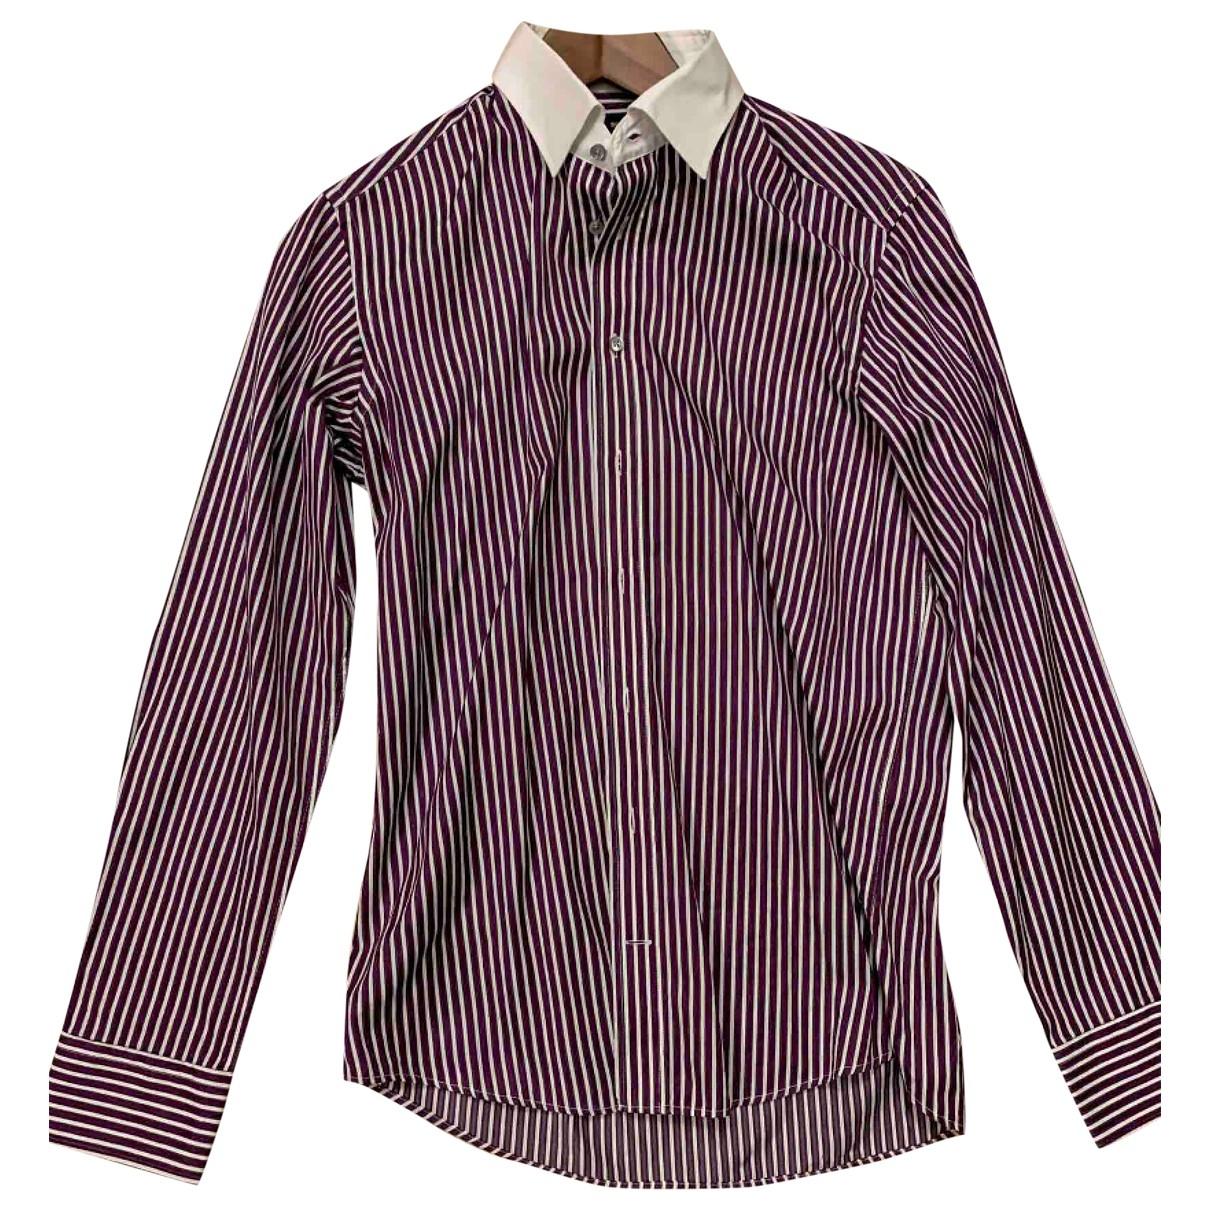 Sand \N Multicolour Cotton Shirts for Men 39 EU (tour de cou / collar)